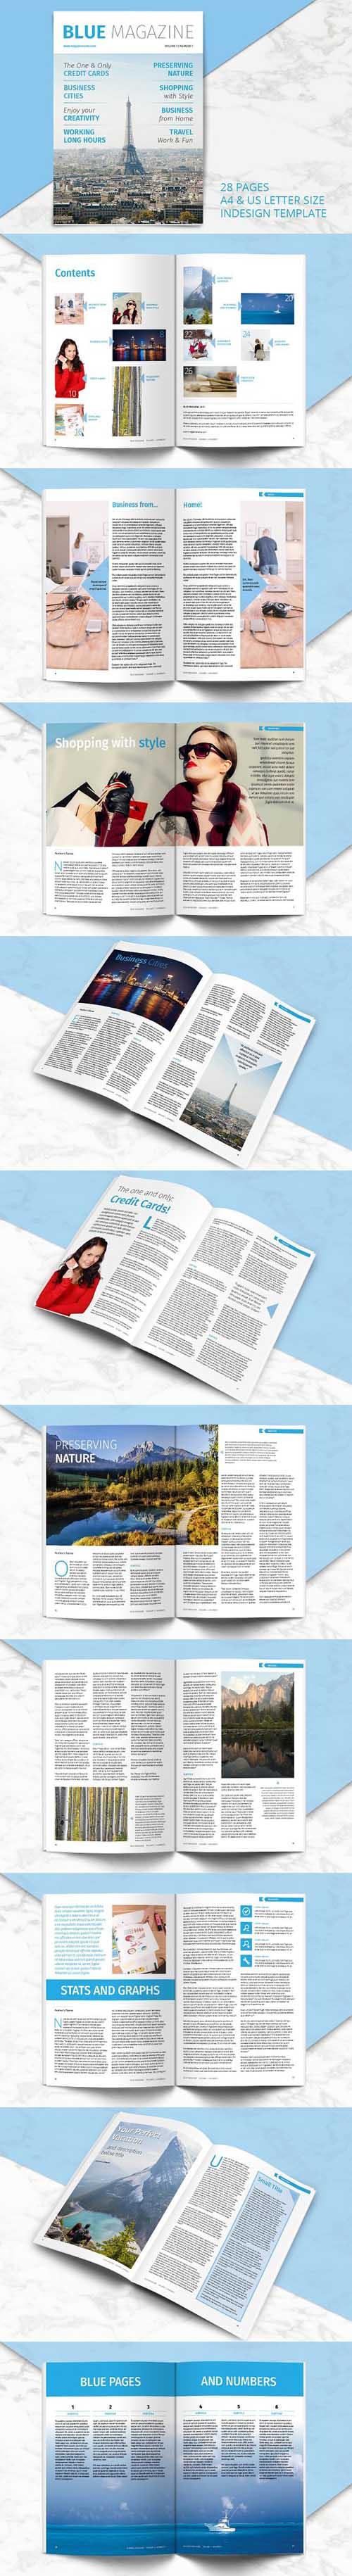 Blue Magazine 1298952